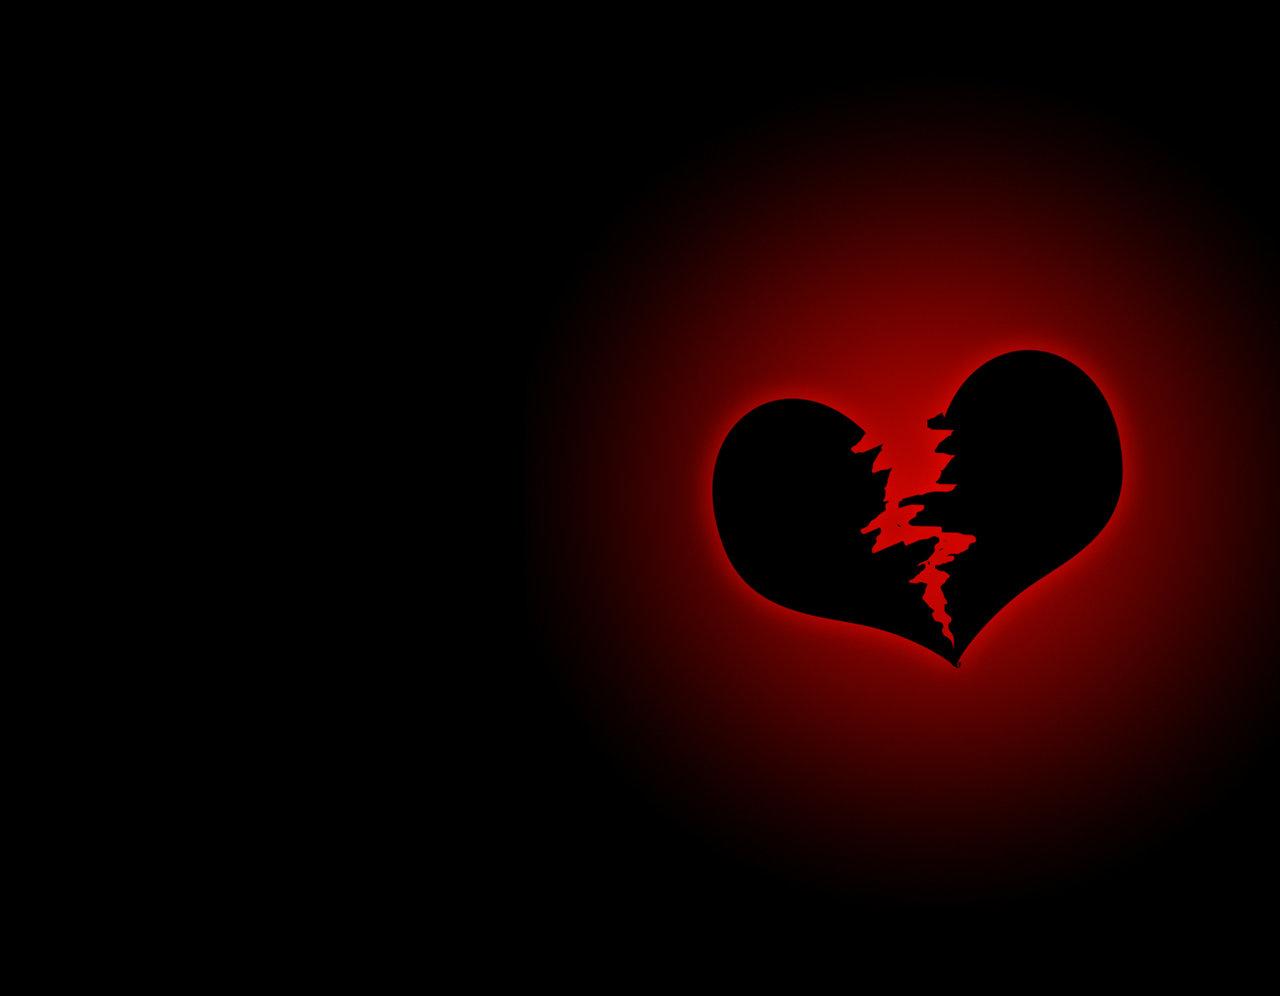 Broken Heart Wallpapers Hd Wallpapersafari